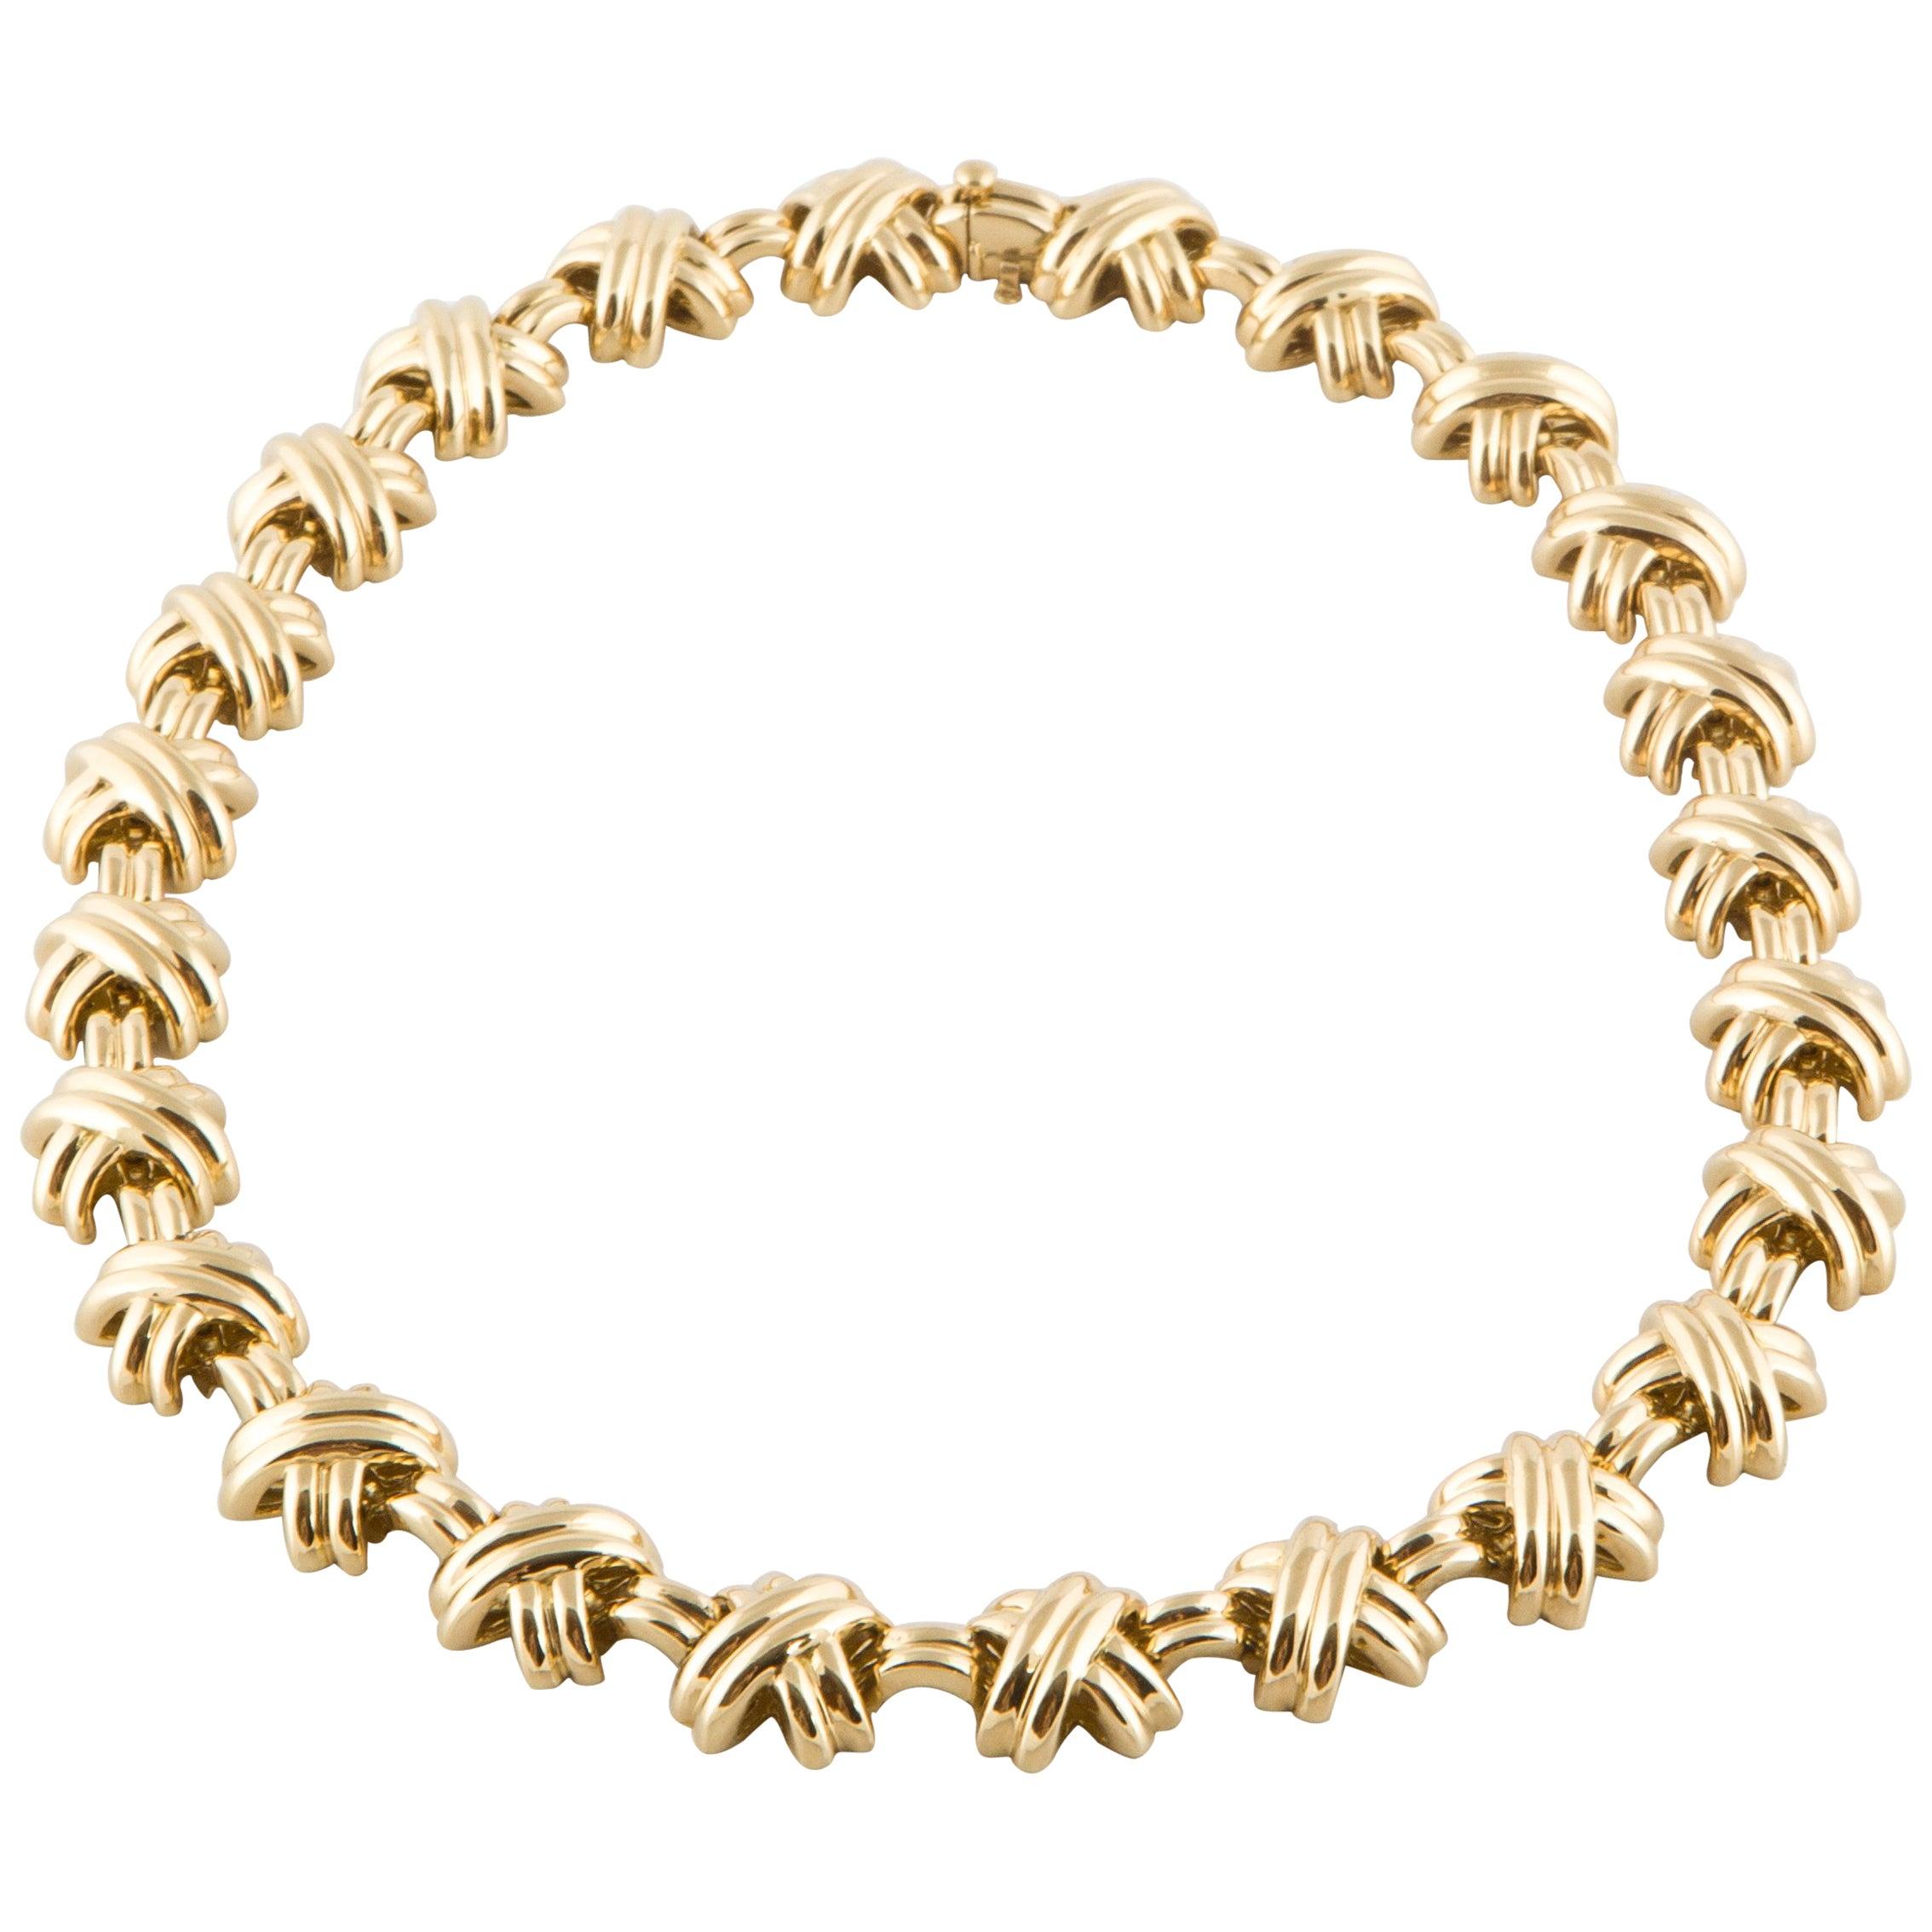 Tiffany & Co. 18 Karat Yellow Gold Necklace